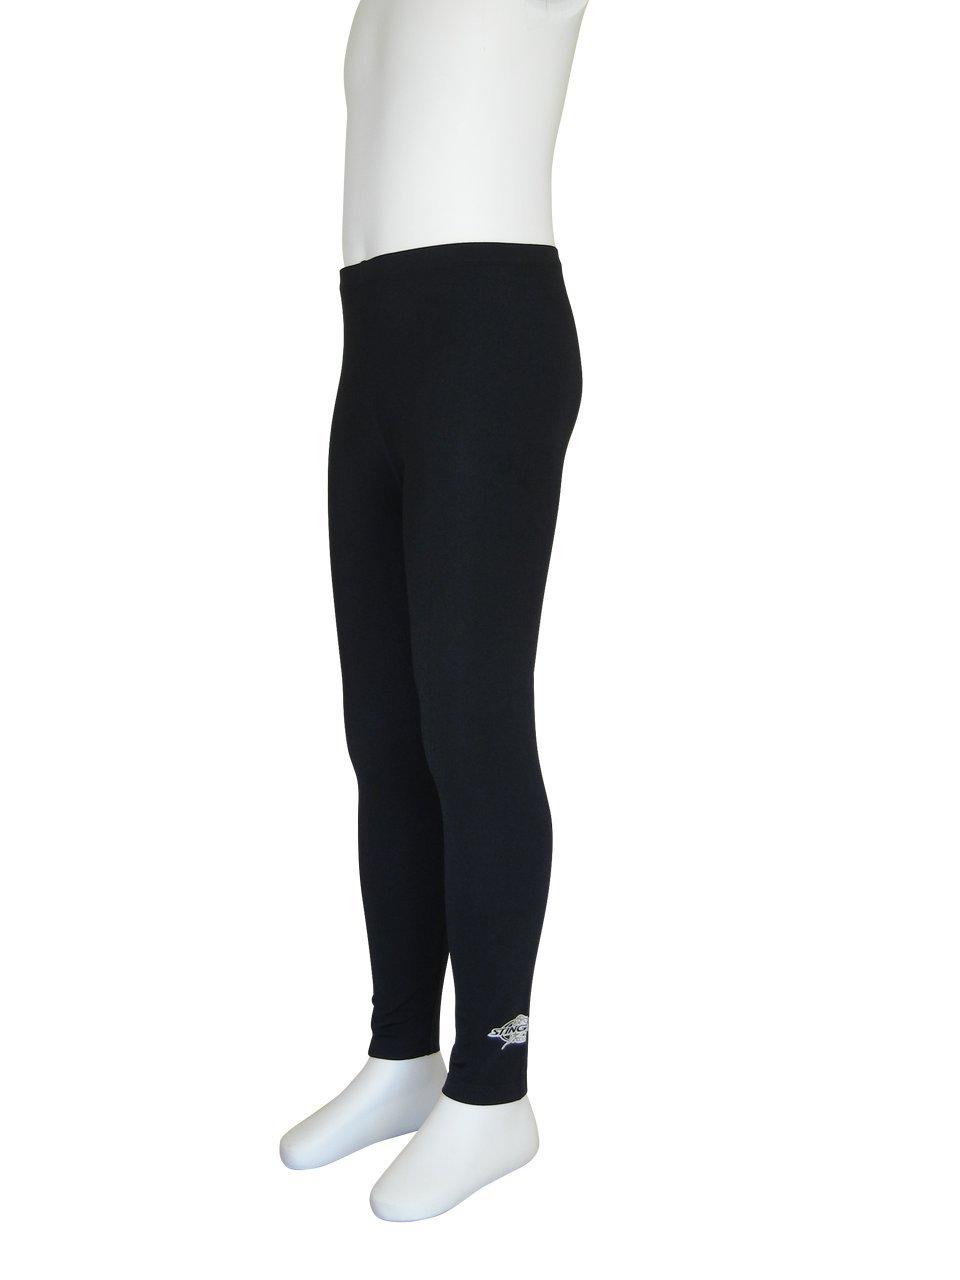 Stingray Black UV Sun Protective Swim Tights for Boys /& Girls- Swim Pants sizes 4-14. Sun Protection Swimming Leggings 6